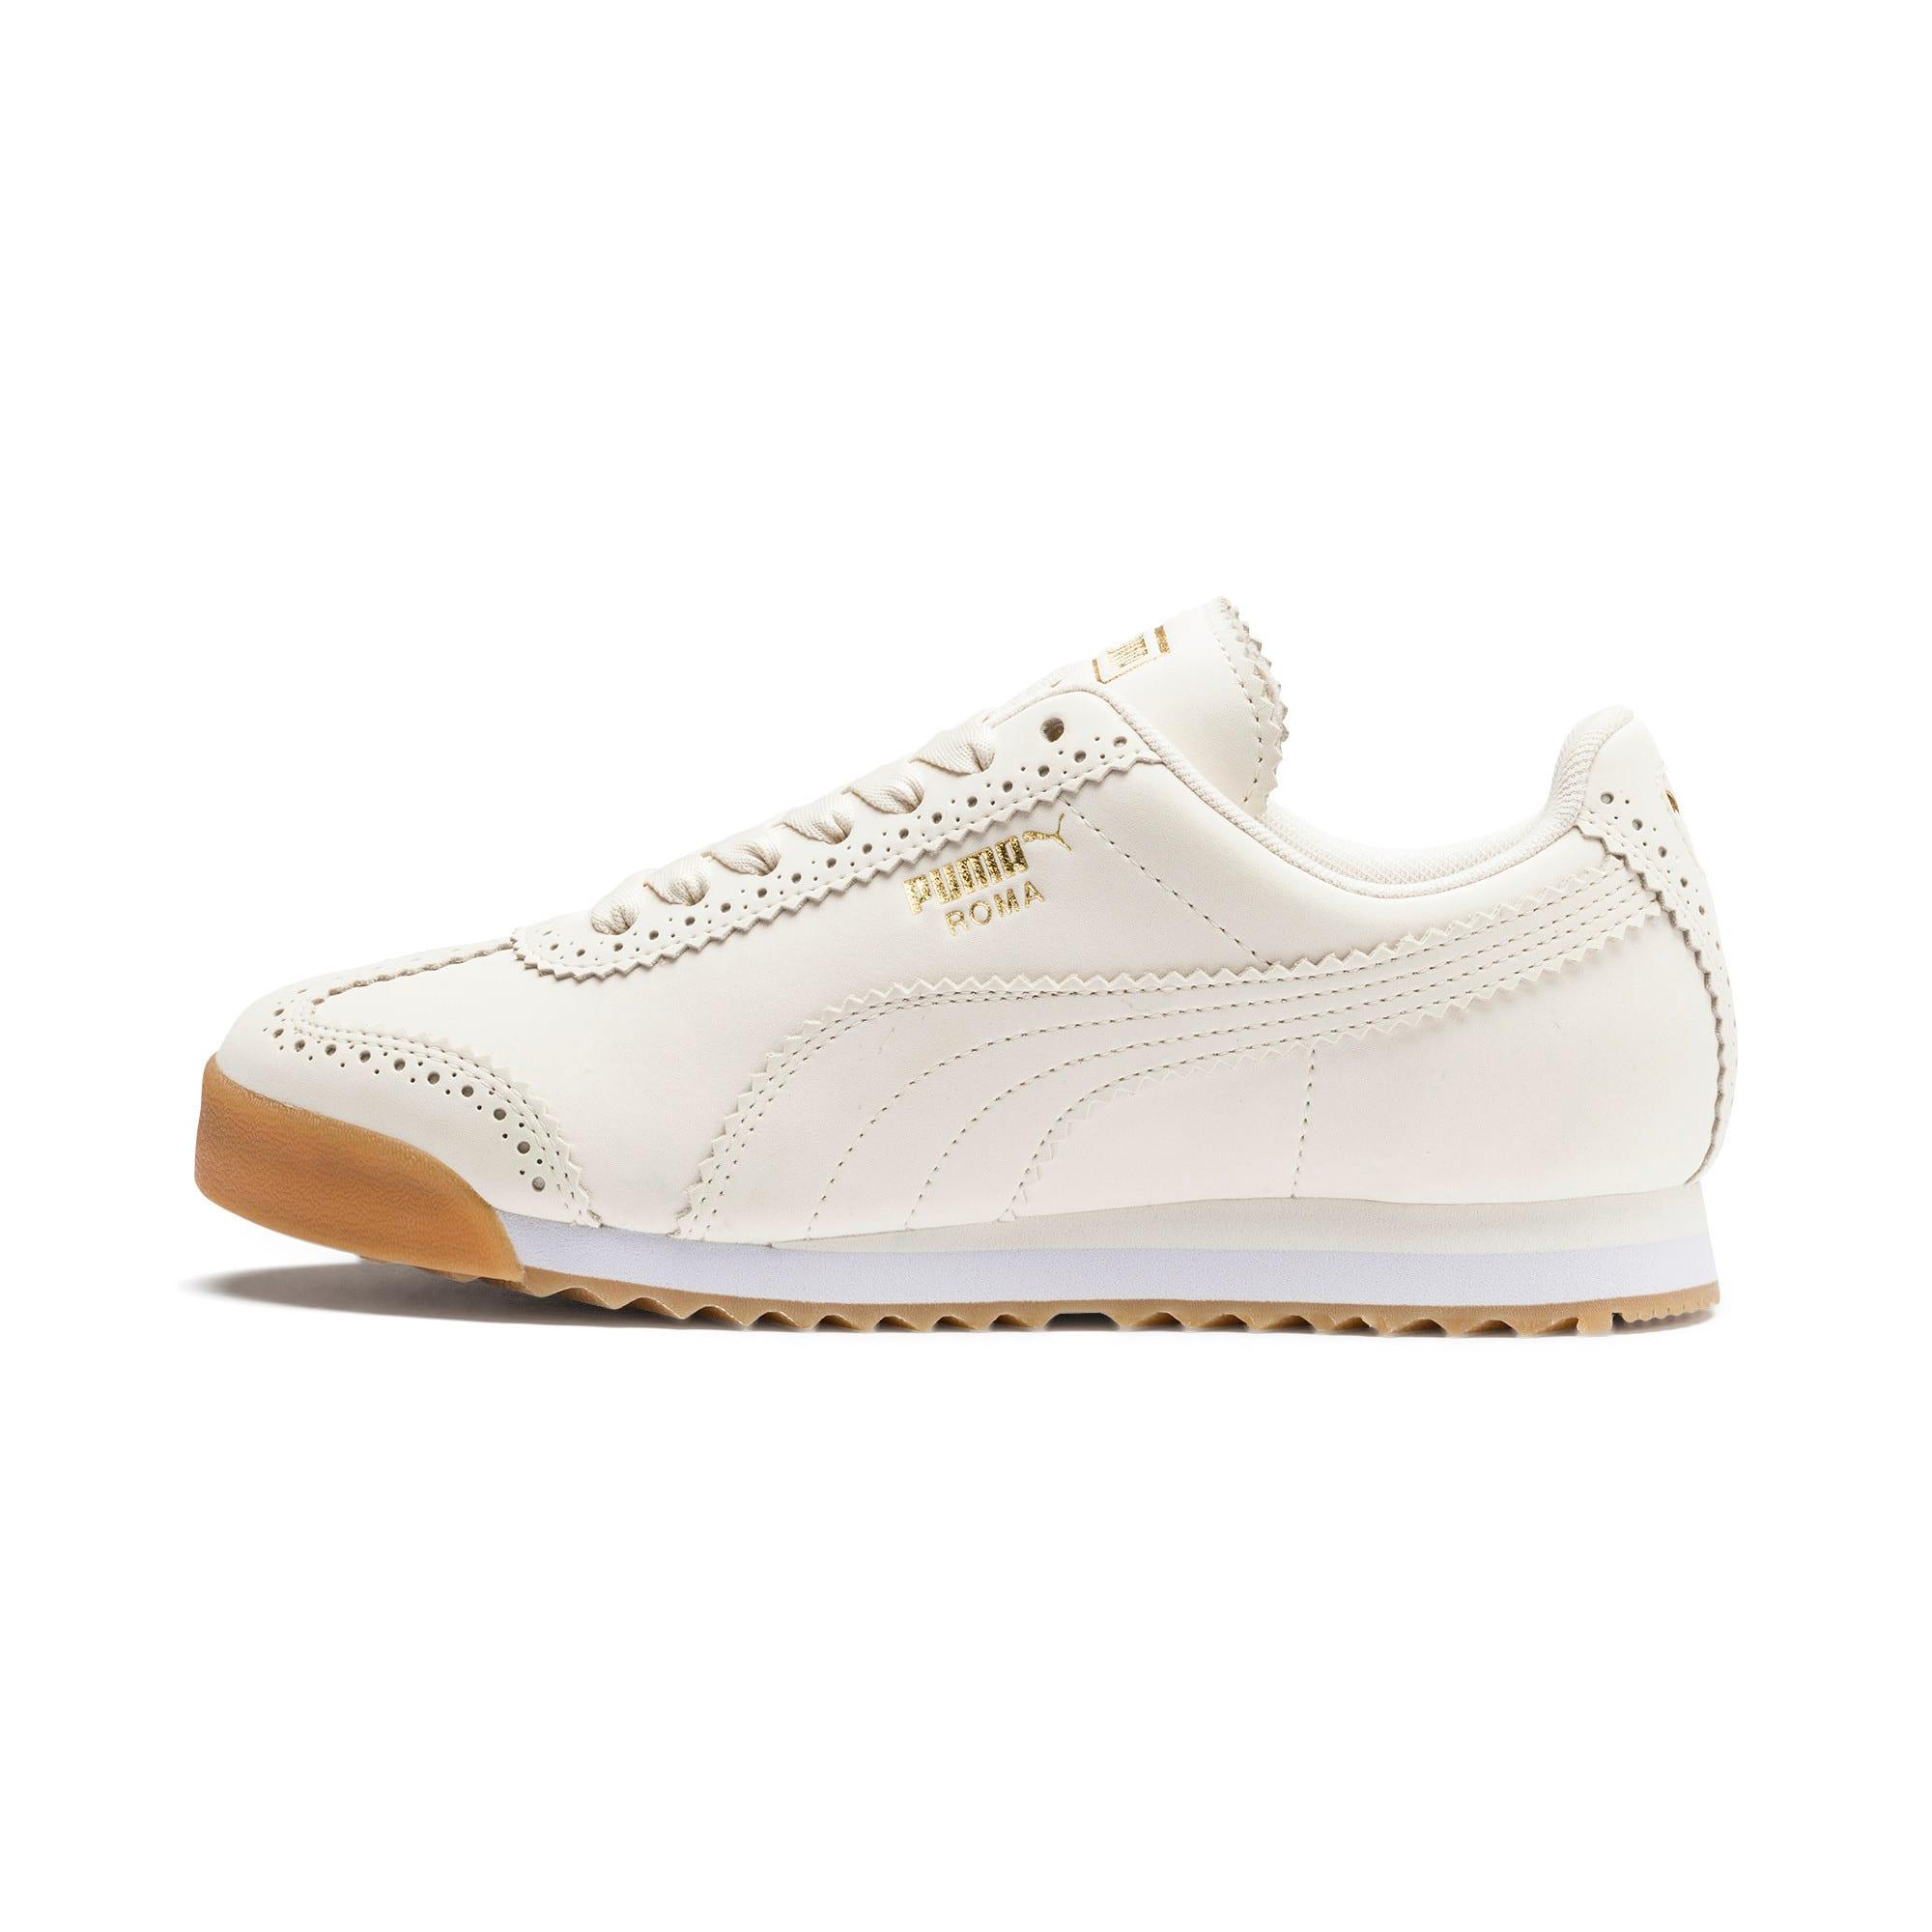 Miniatura 1 de Zapatos deportivos Roma Brogue para mujer, Pastel Parchment-P.Team Gold, mediano